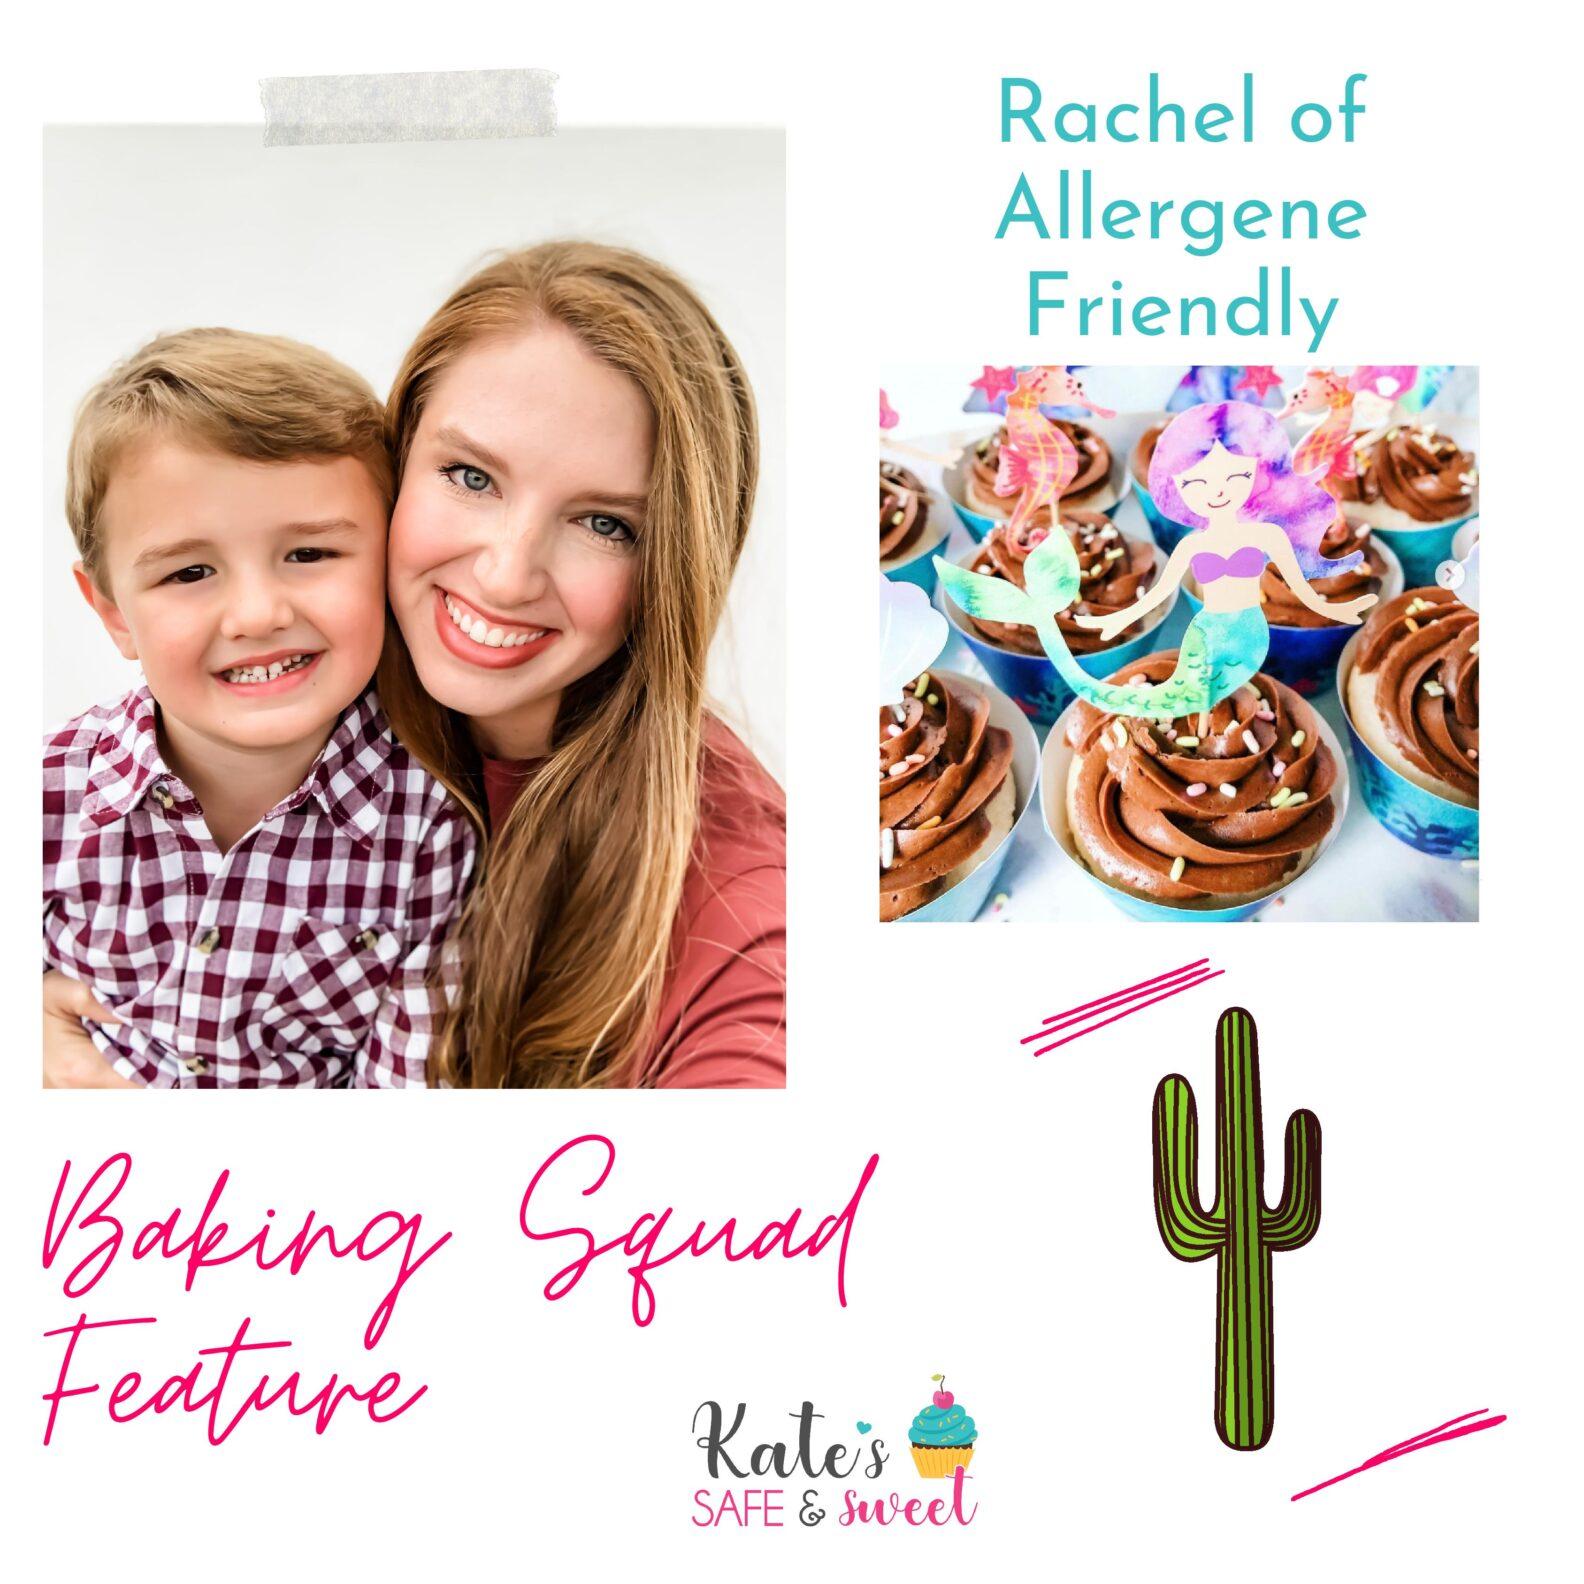 Rachel Allergene Friendly - Baking Squad Feature